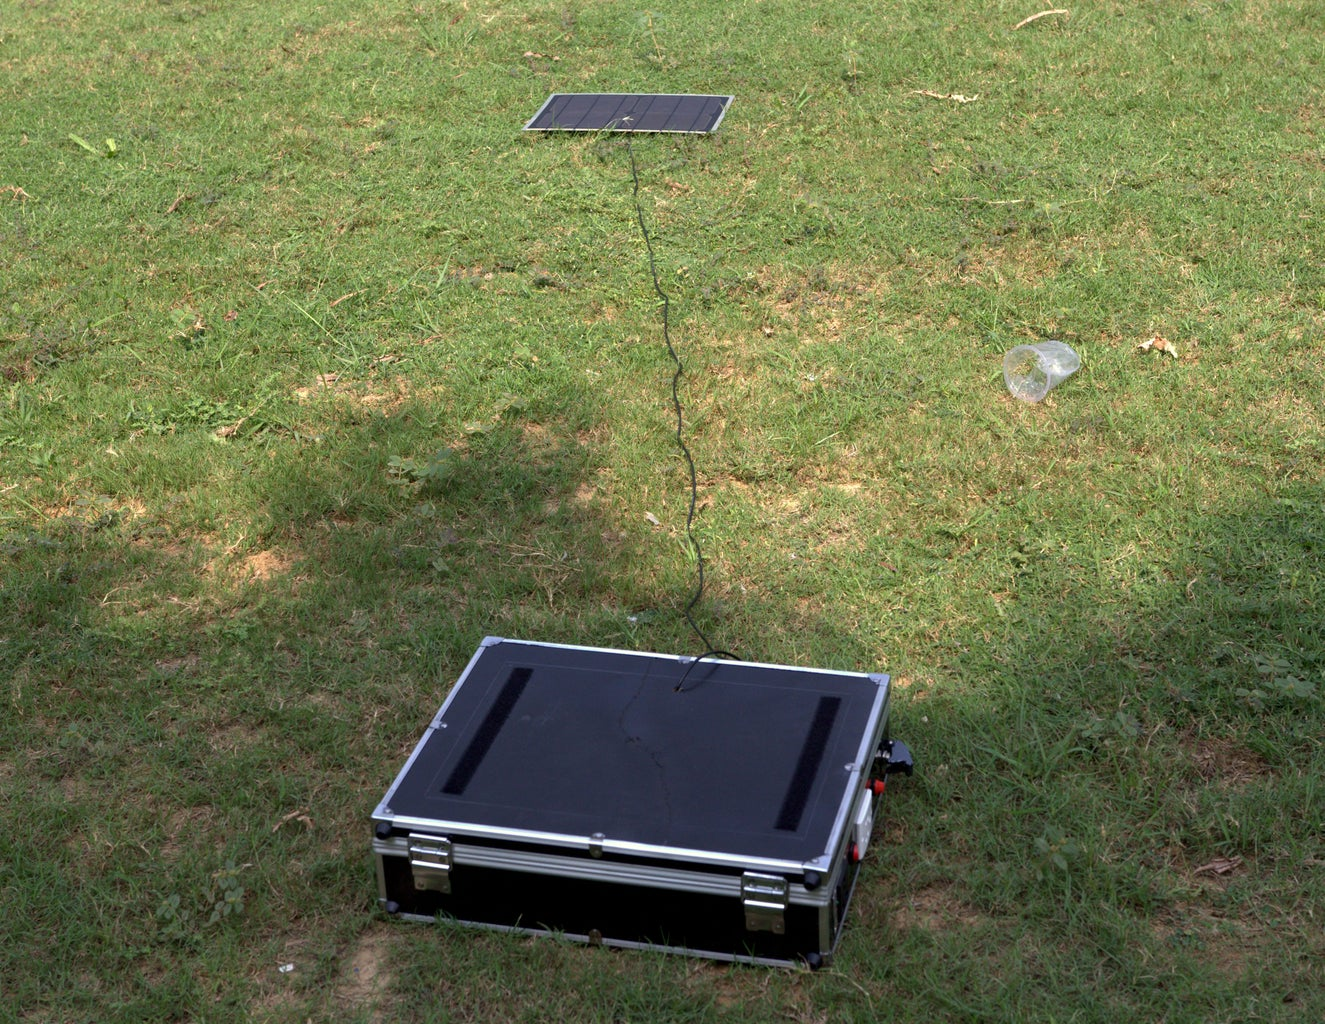 Mount the Solar Panel